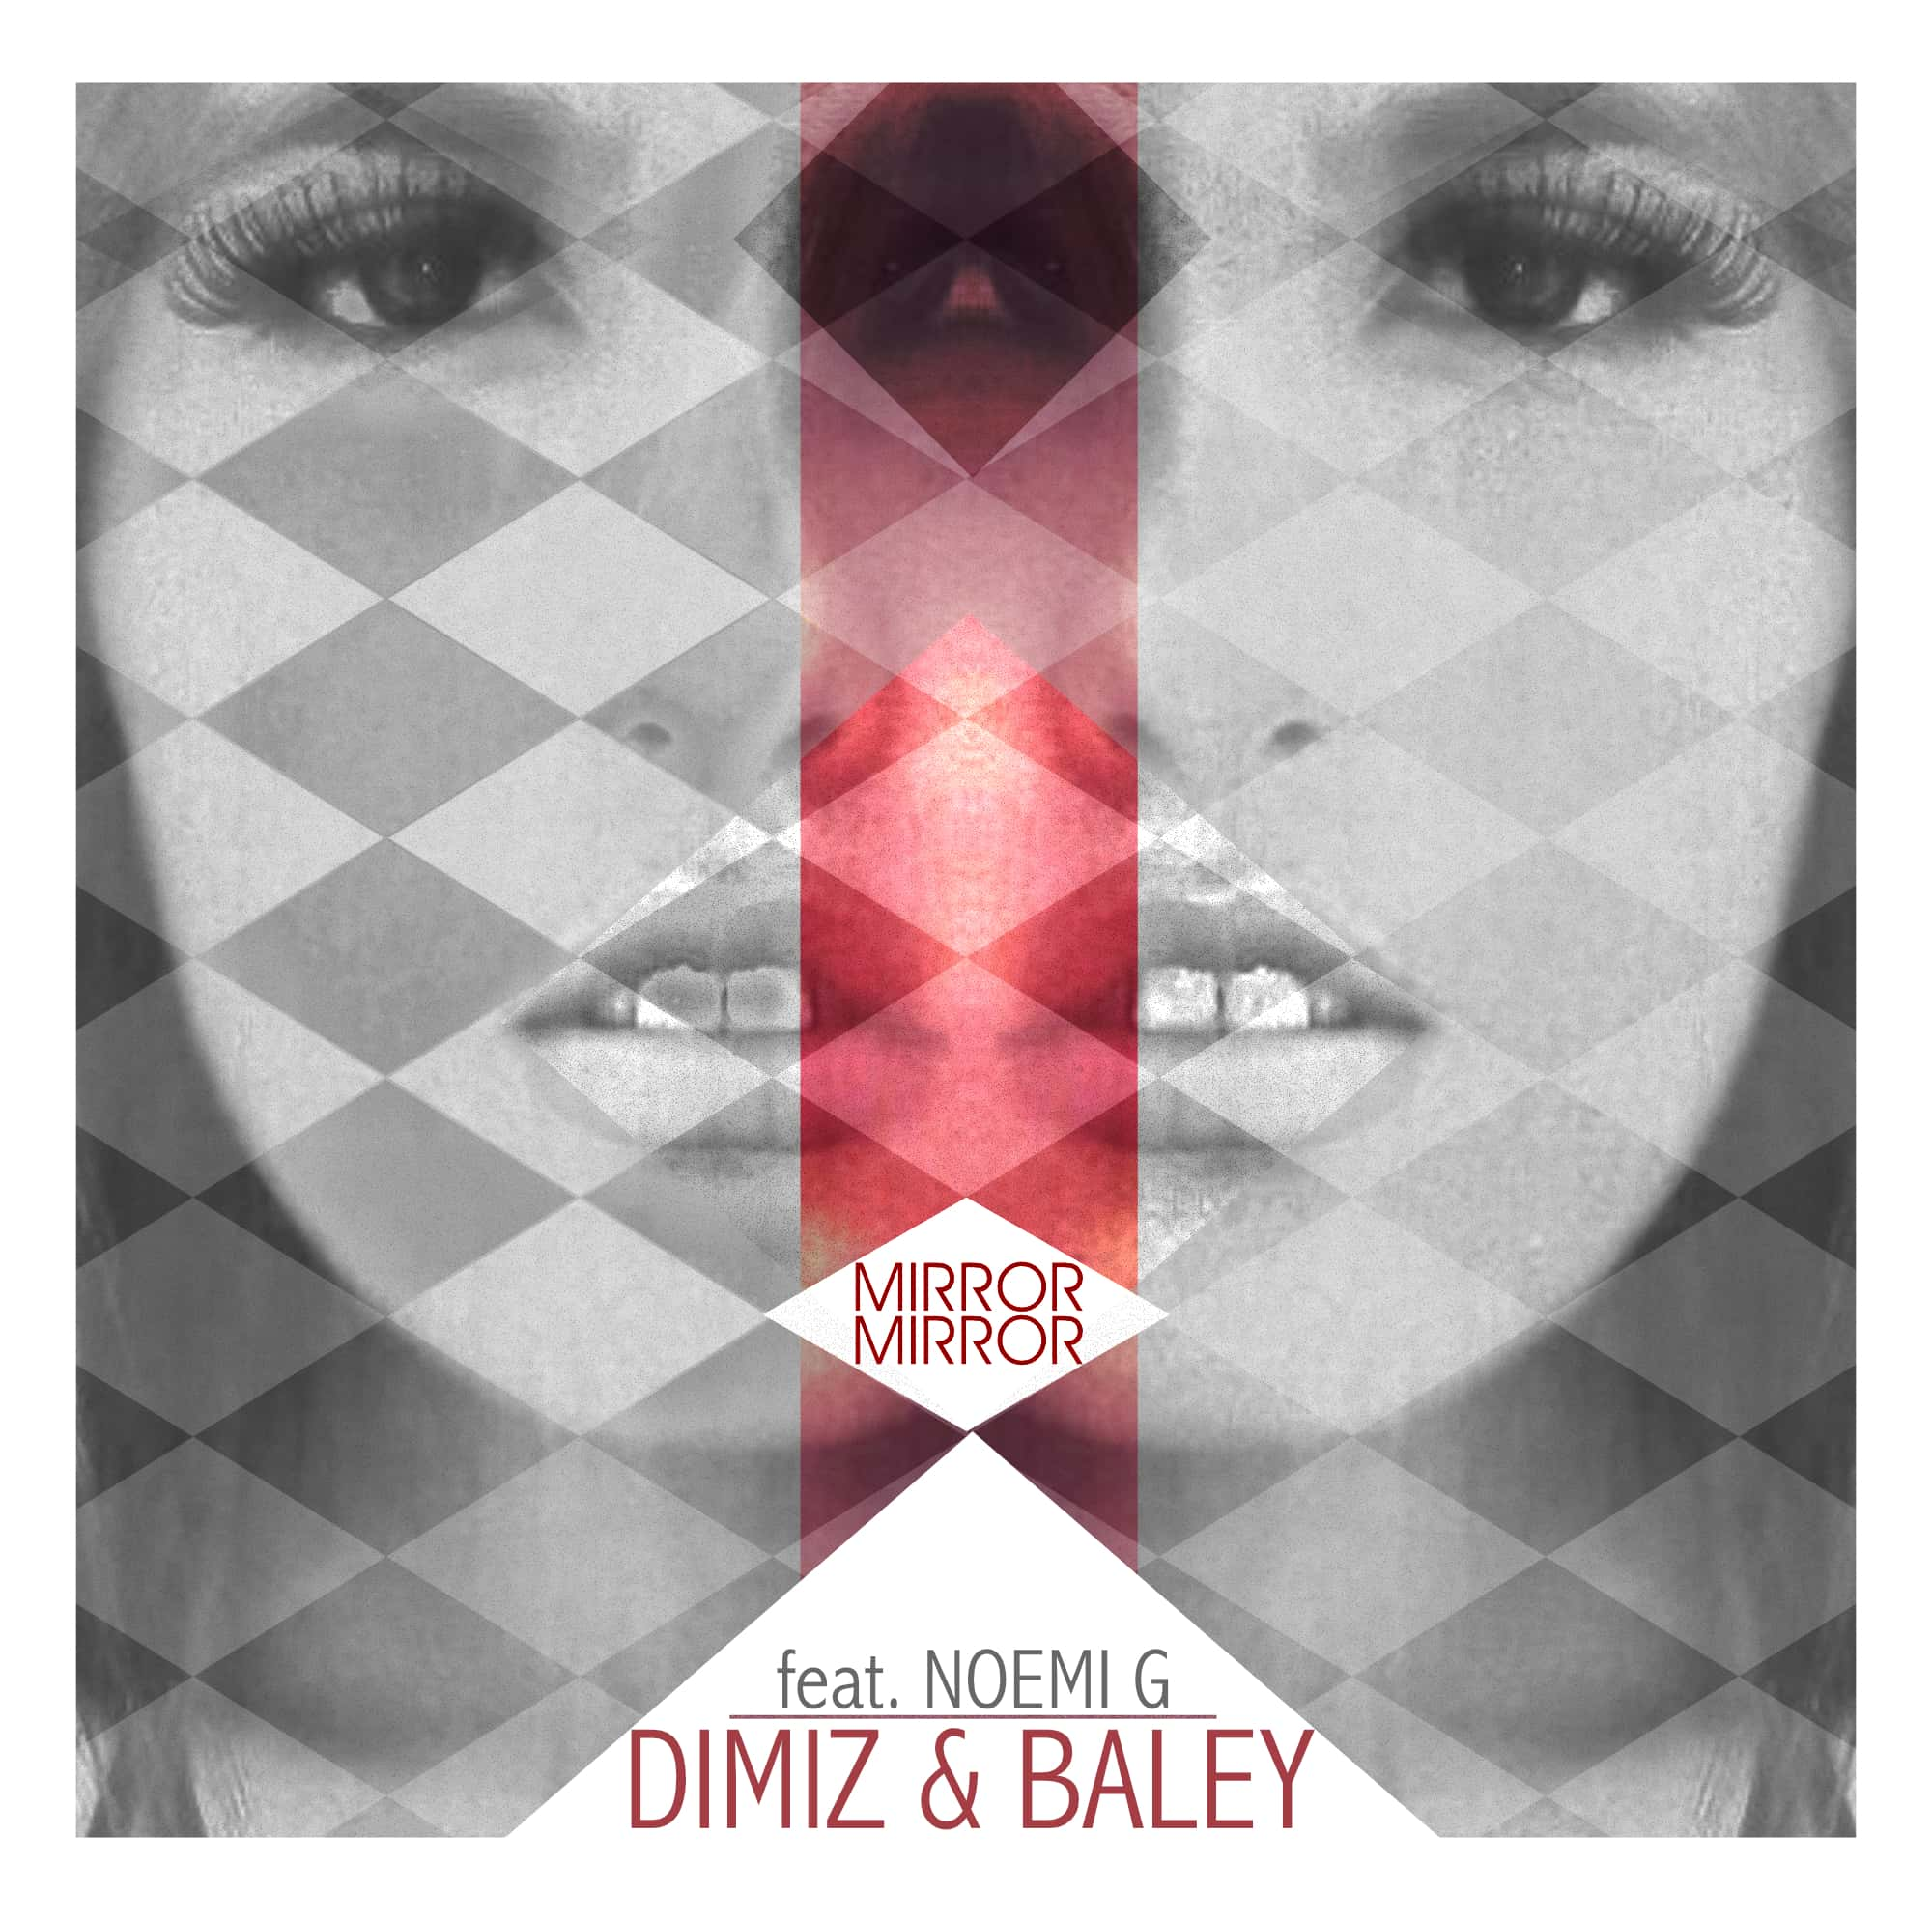 Dimiz & Baley - Mirror Mirror feat. NoemiG